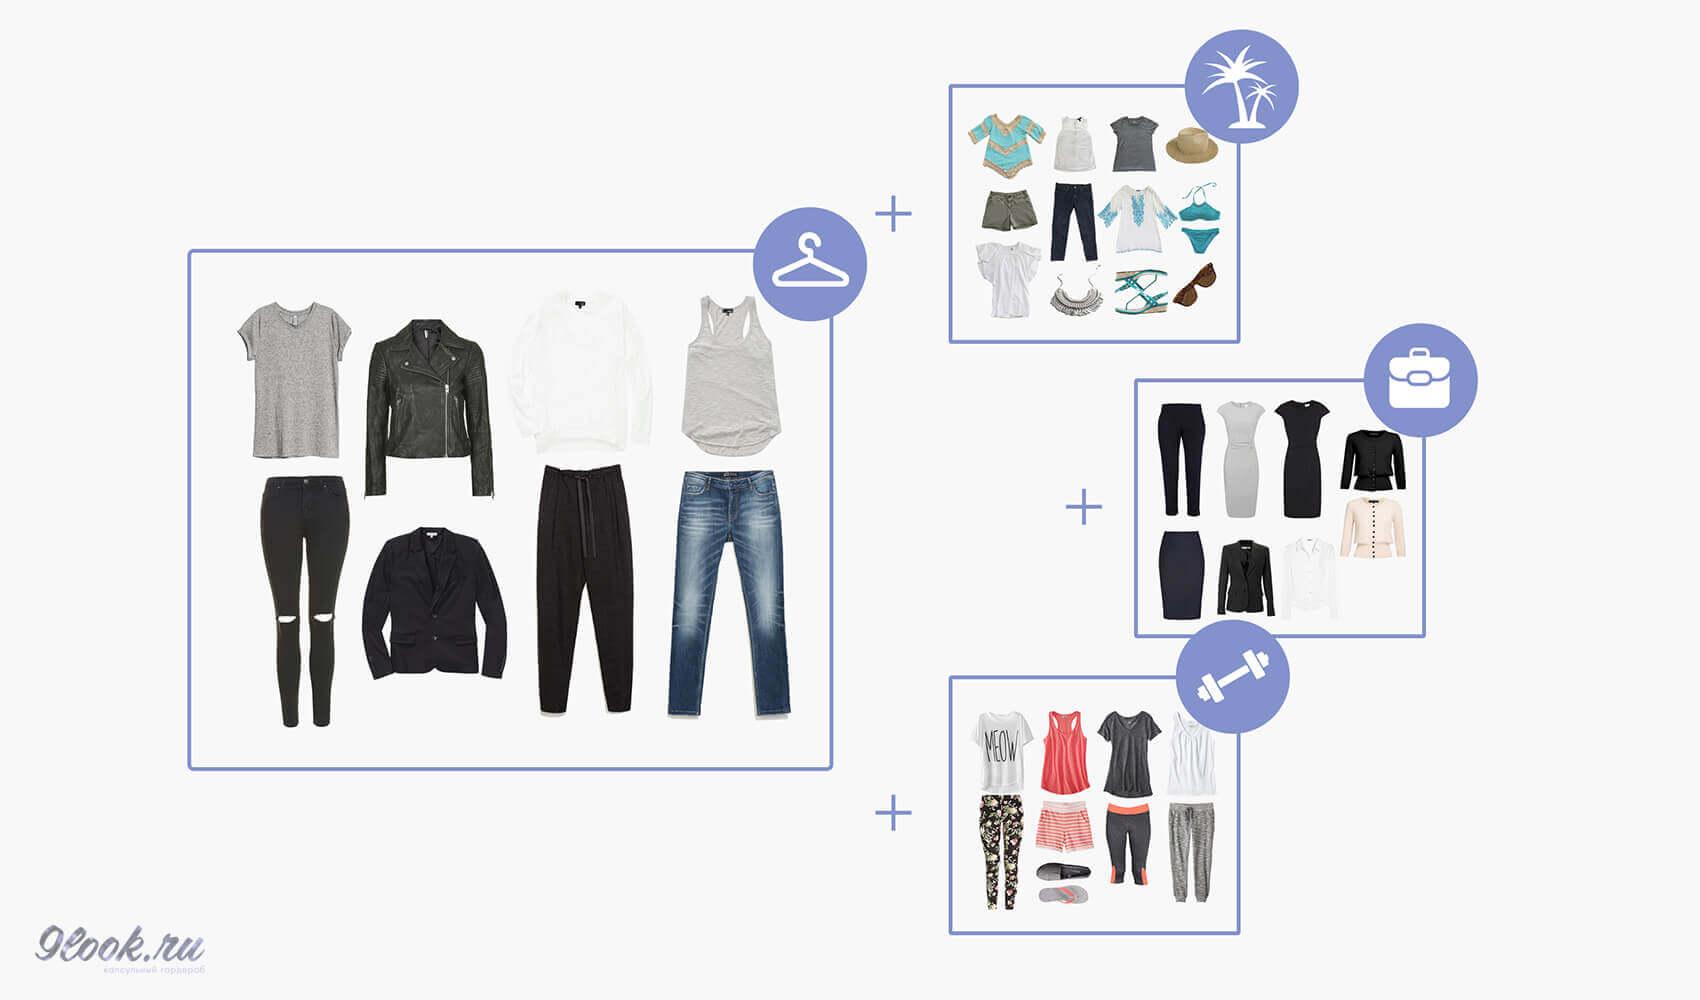 Схема оптимального гардероба